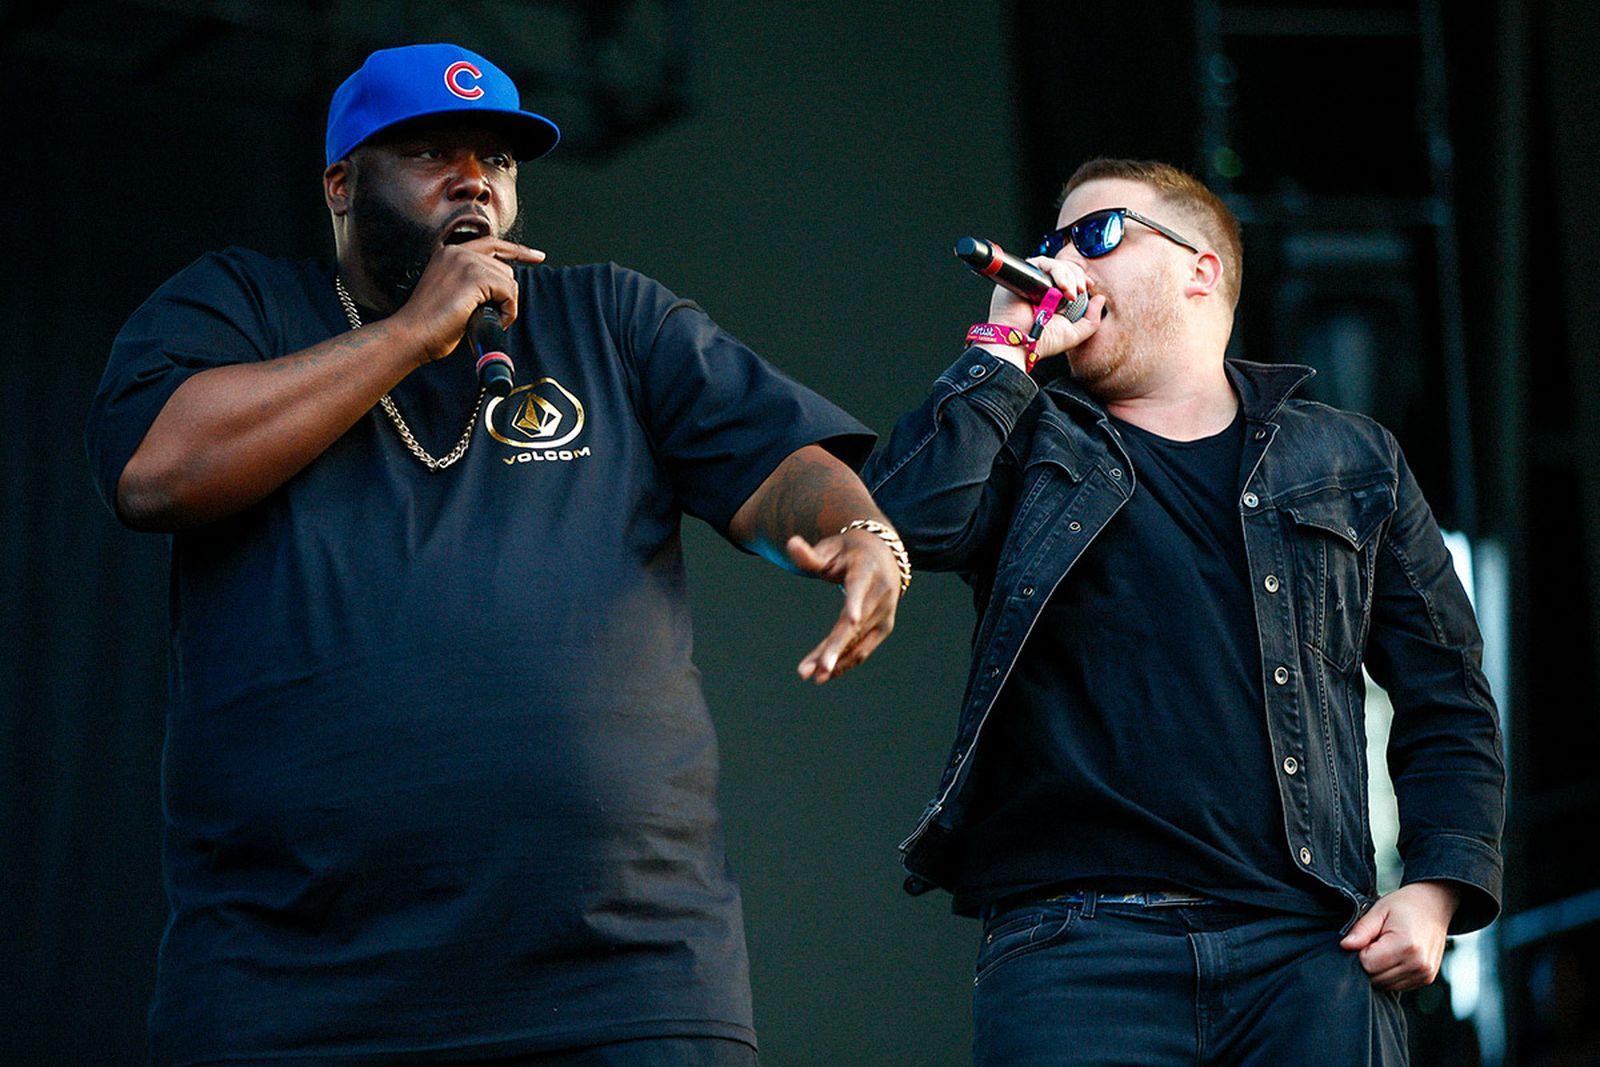 new breed hip hop artists can learn run jewels main el-p killer mike run the jewels